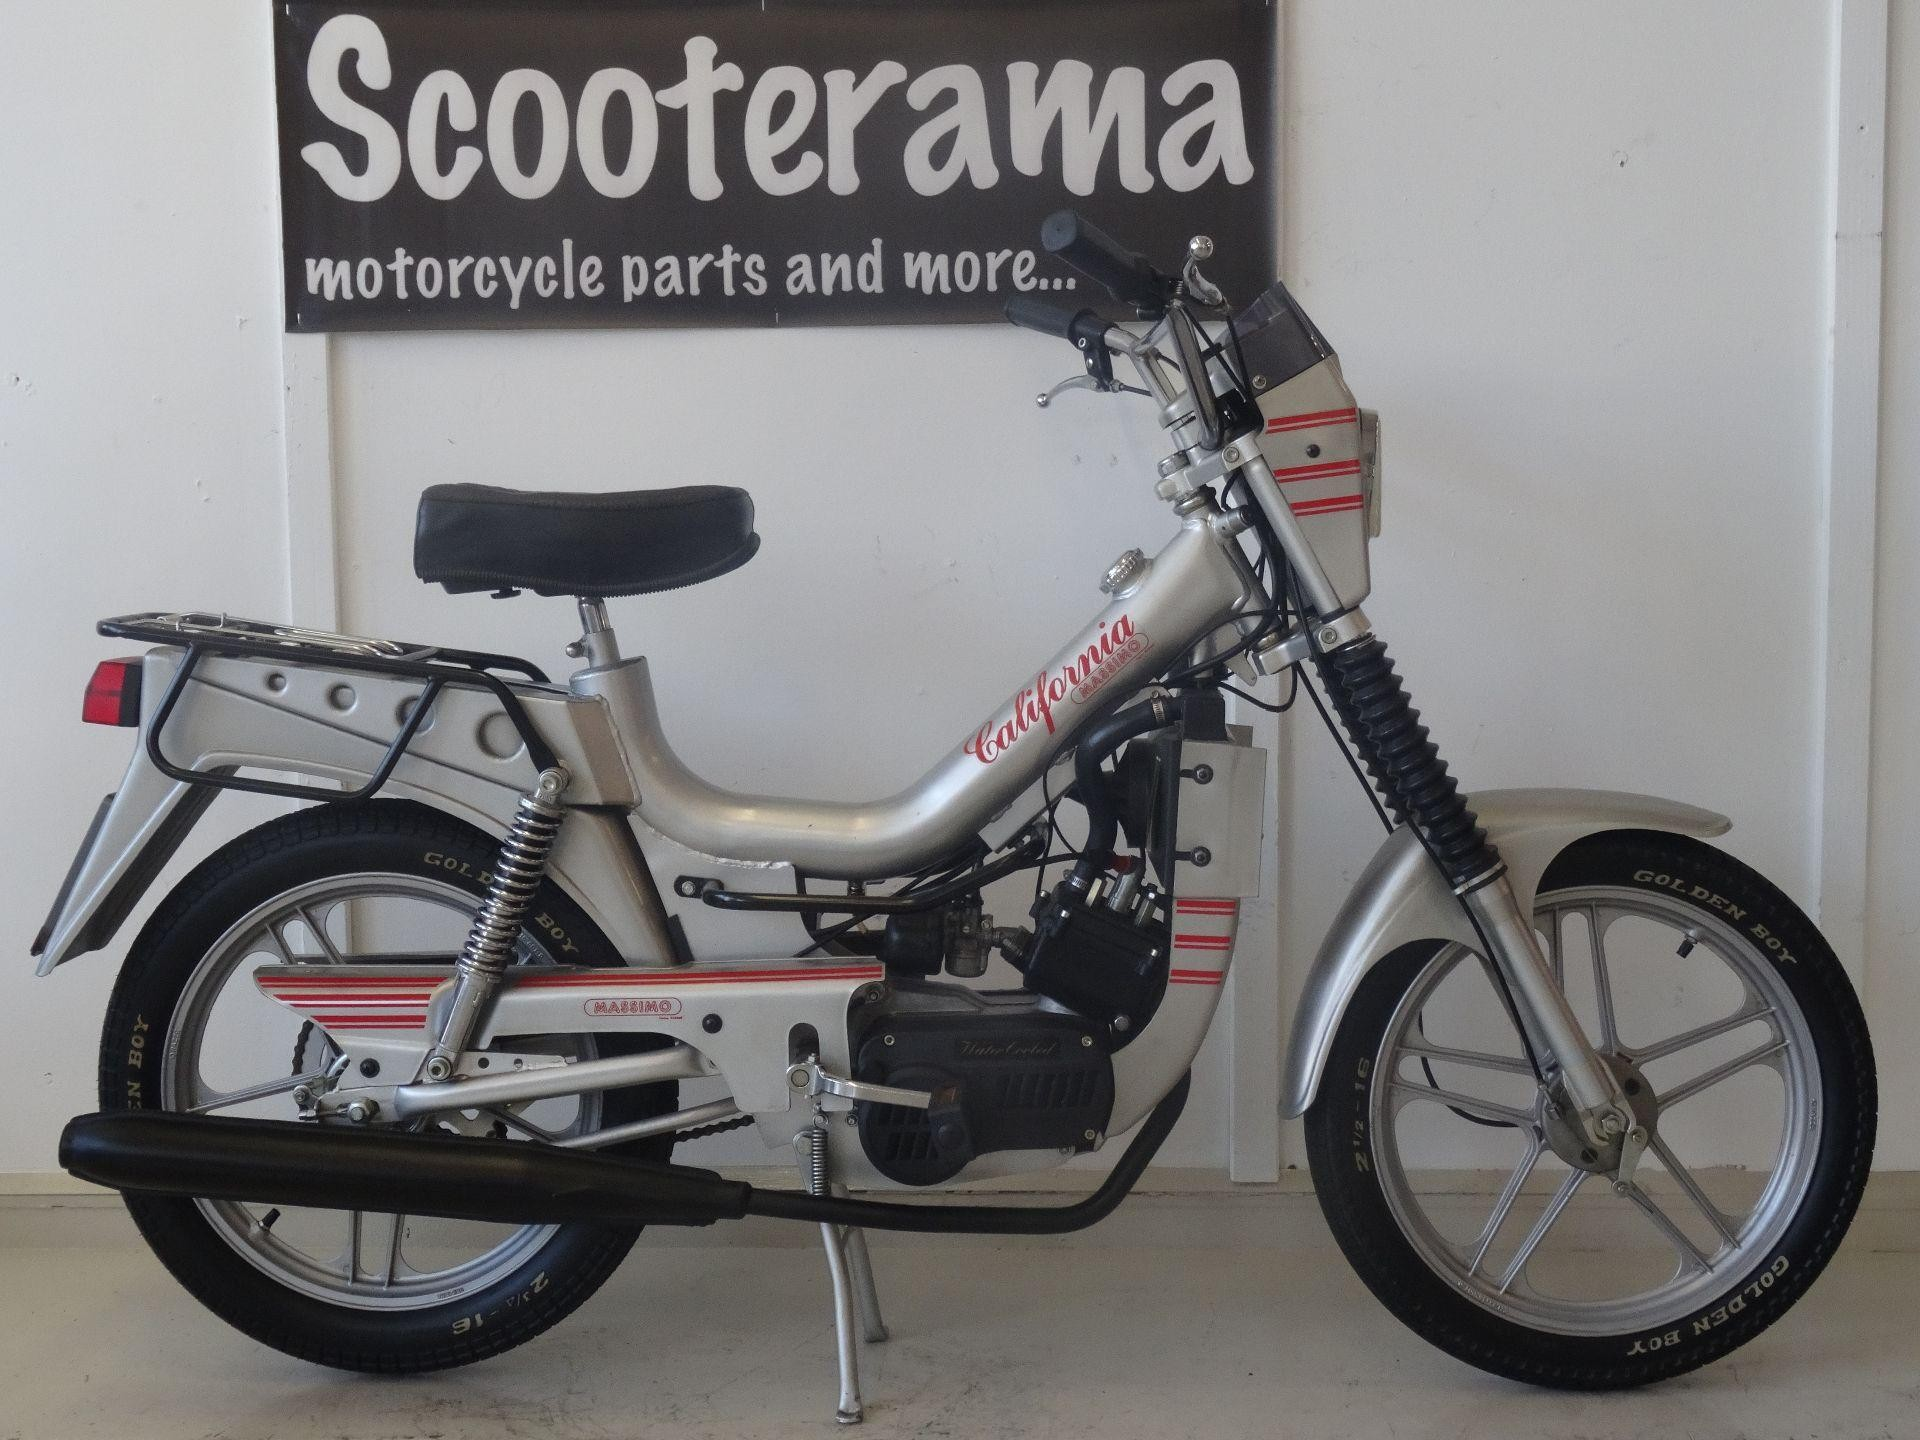 motorrad occasion kaufen massimo california scooterama. Black Bedroom Furniture Sets. Home Design Ideas